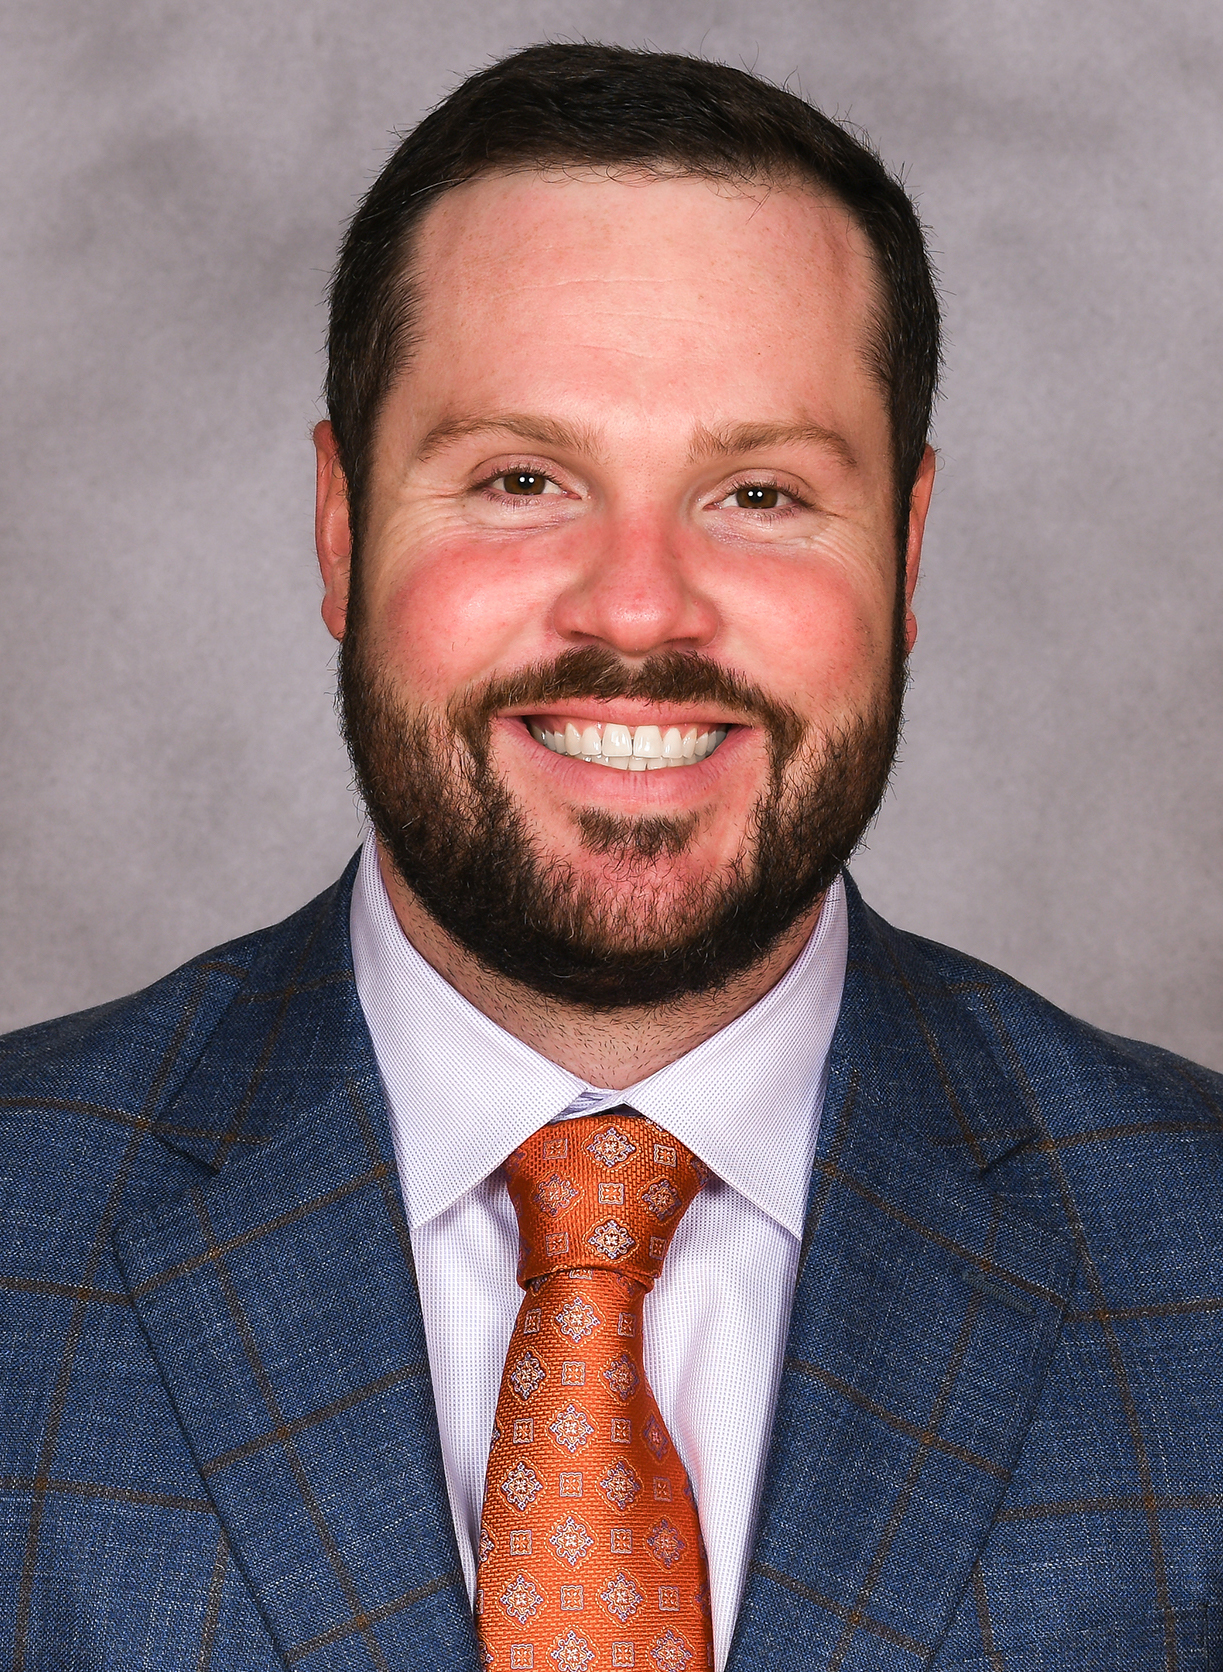 Ben Winterrowd - - Clemson University Athletics